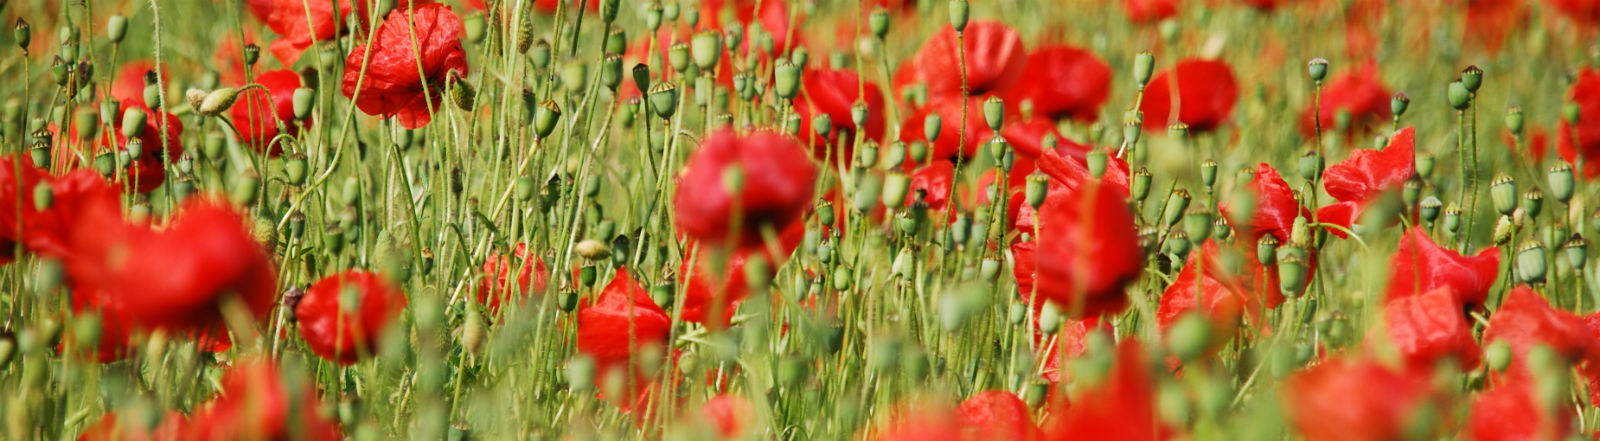 Ein Mohnblumenfeld